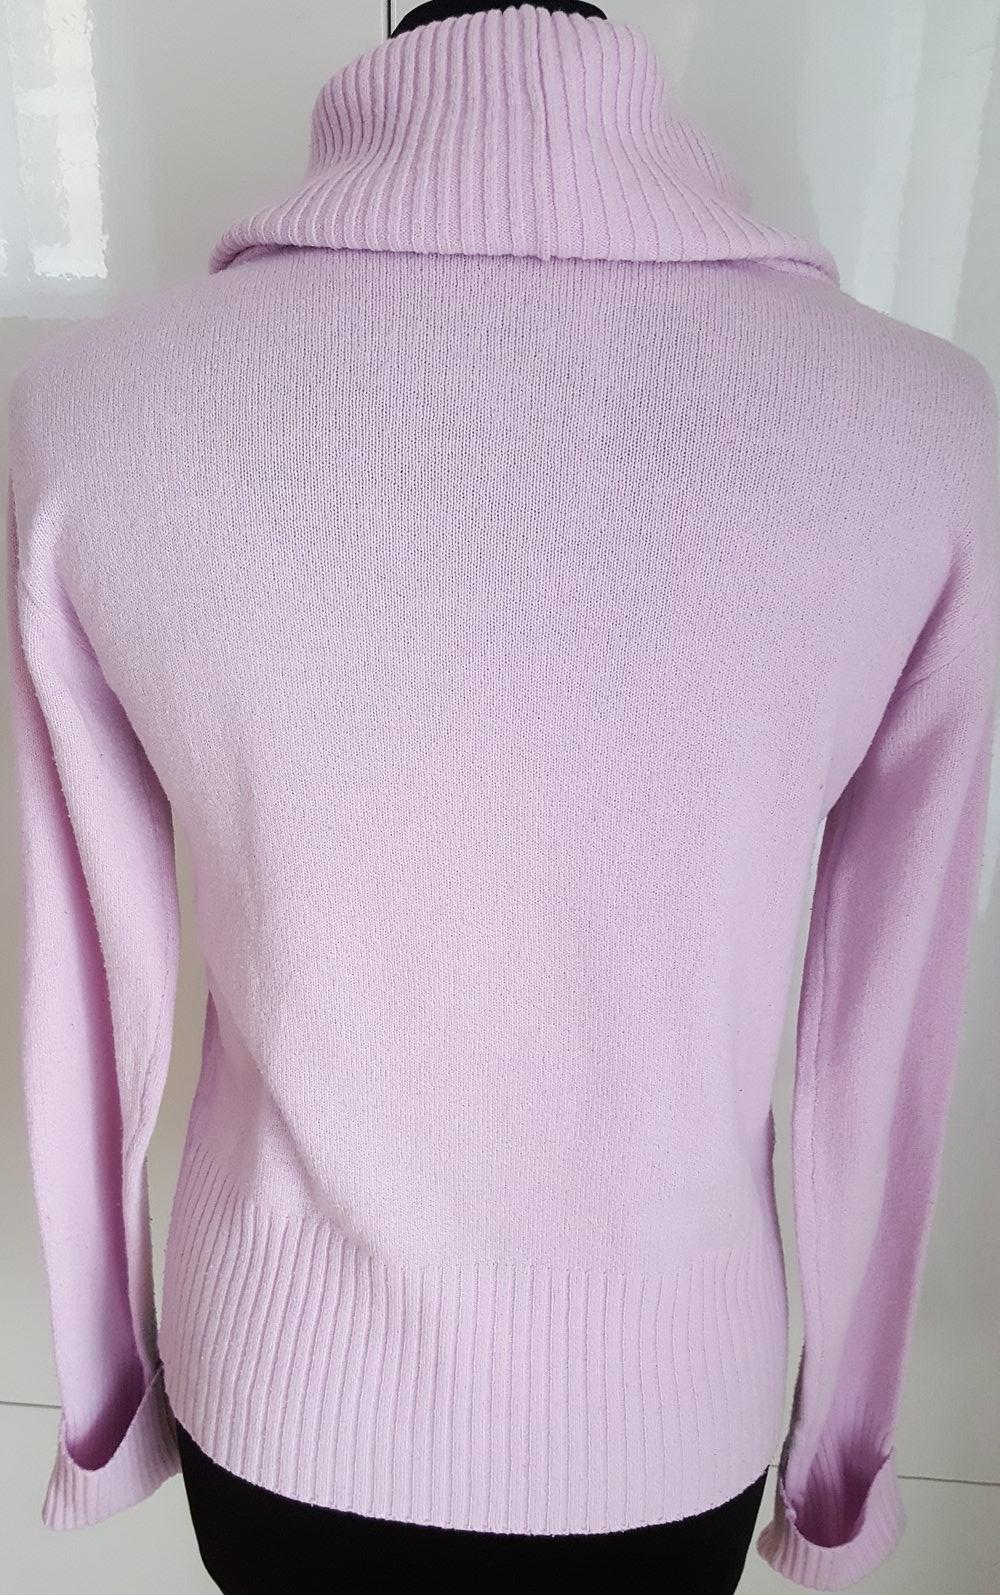 rosa damen rollkragen pullover von elements in gr 38. Black Bedroom Furniture Sets. Home Design Ideas